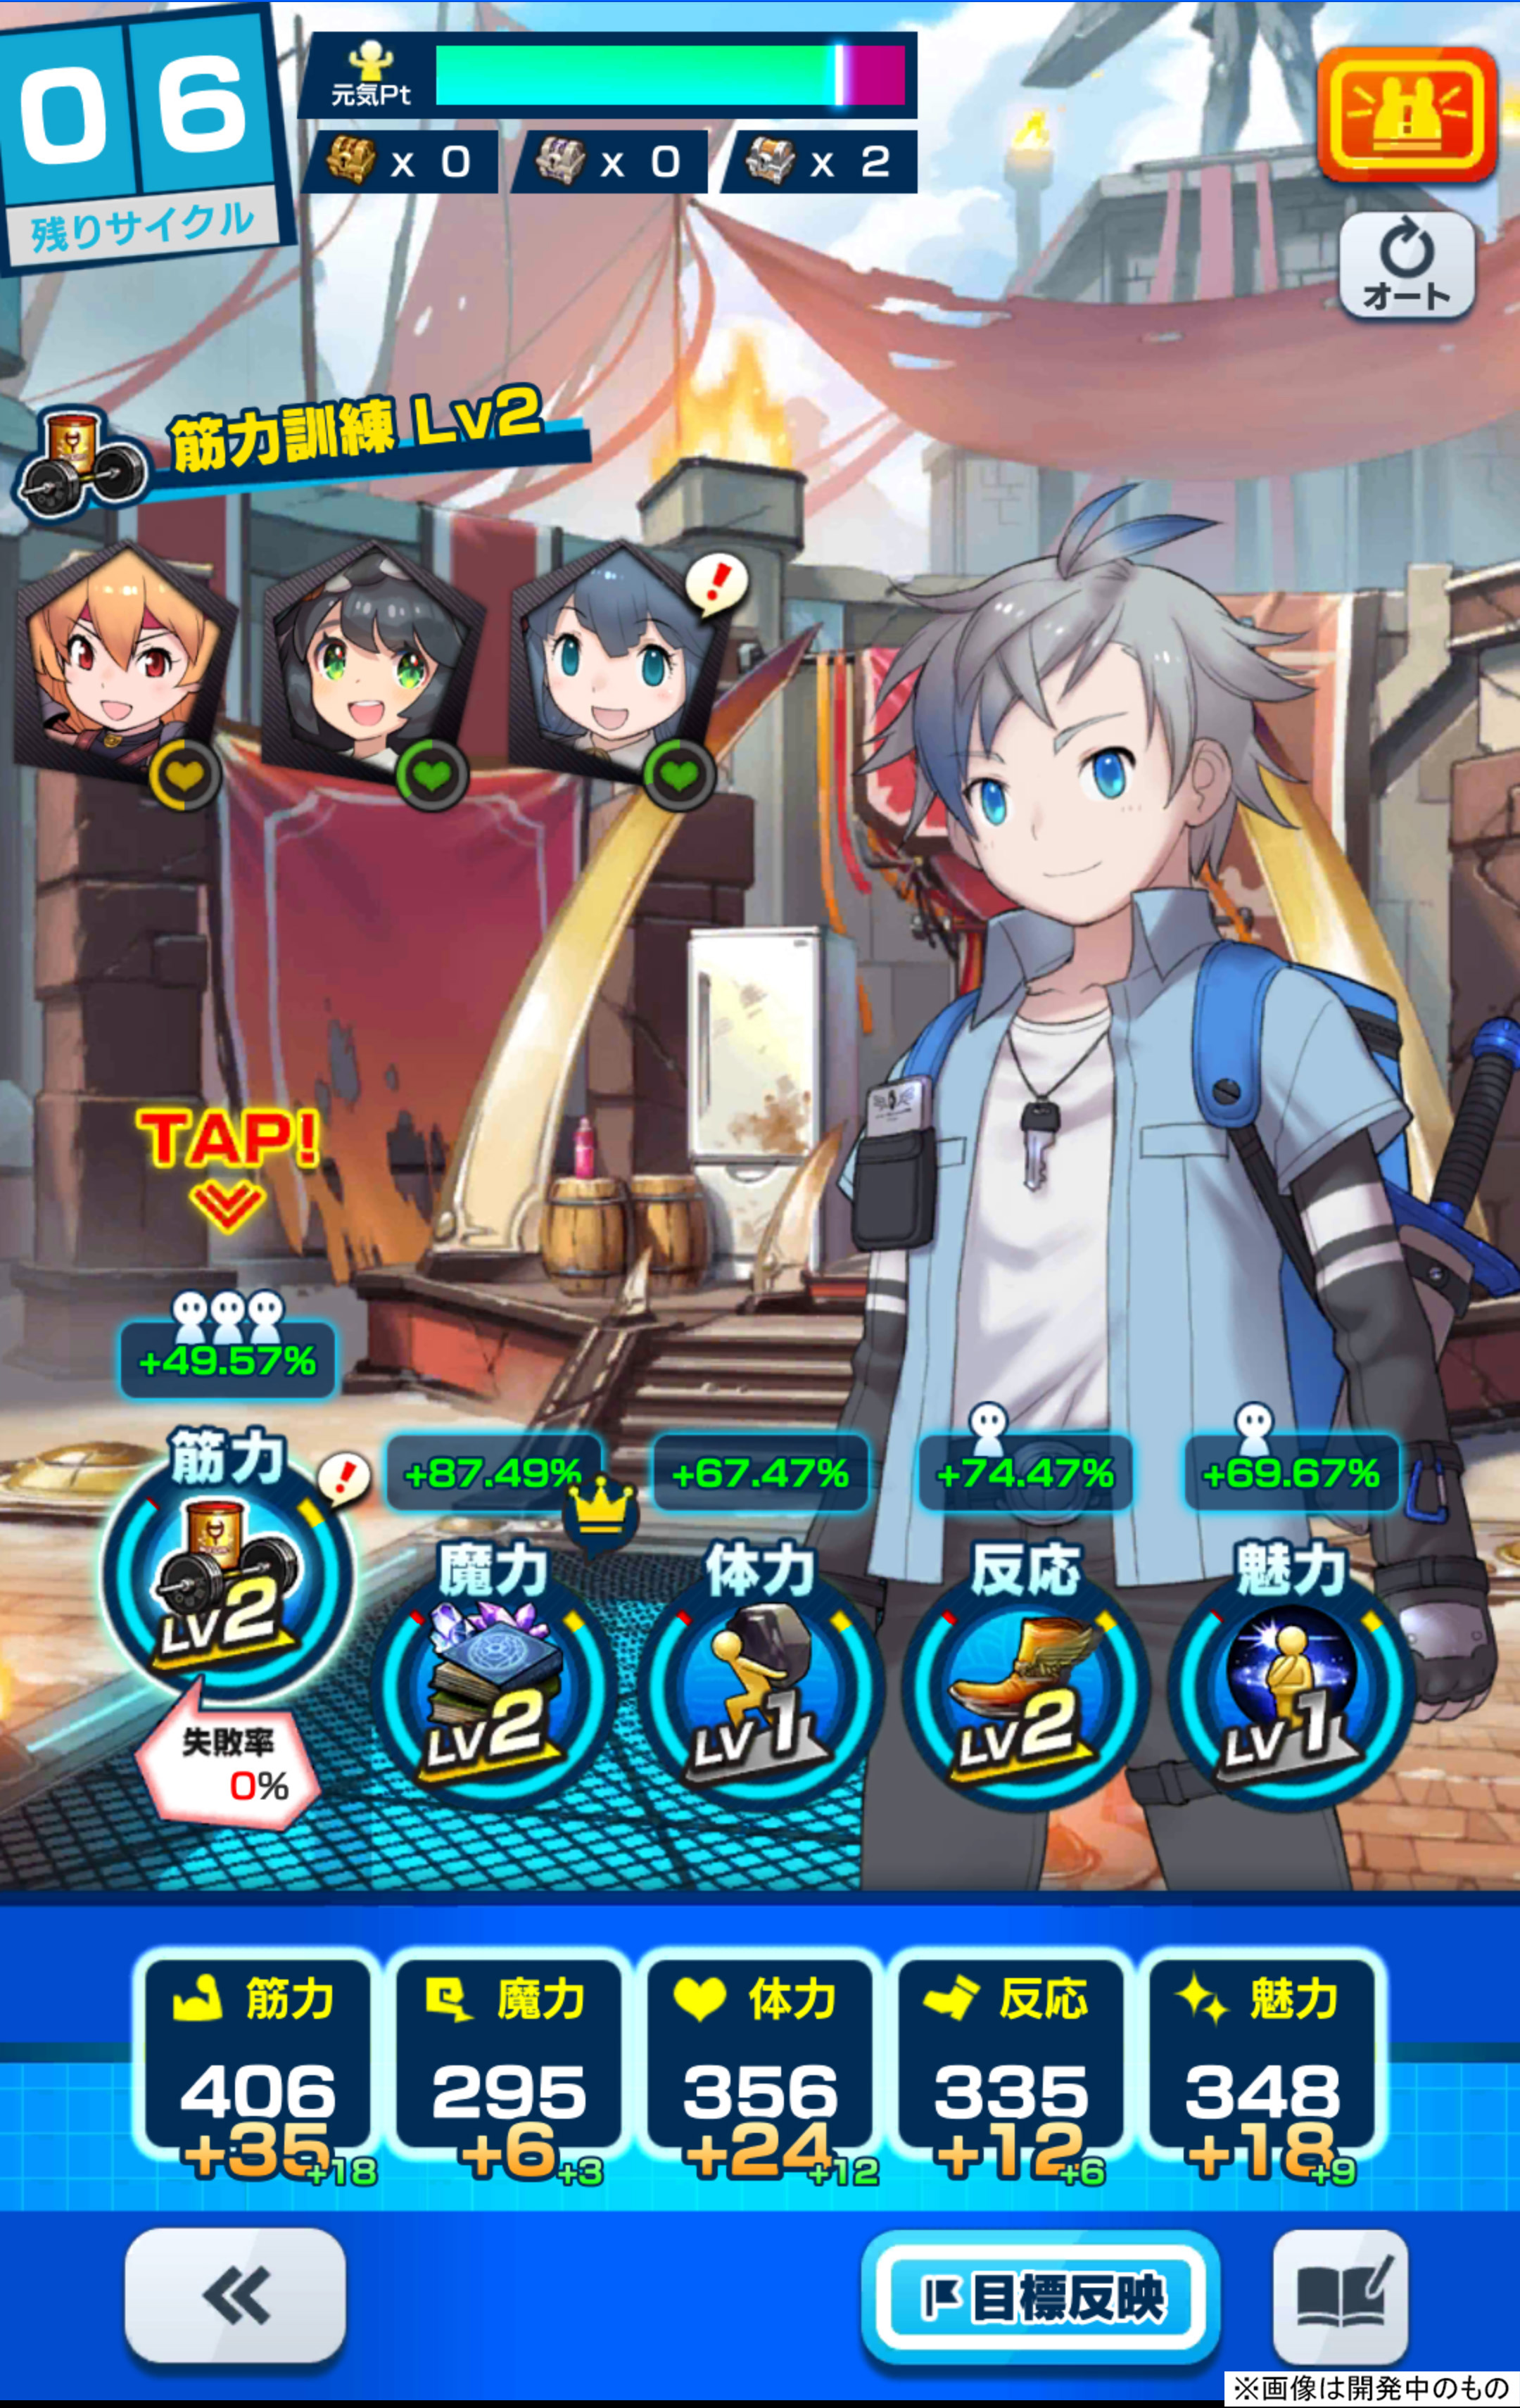 /theme/dengekionline/shachibato/images/system/recruit02